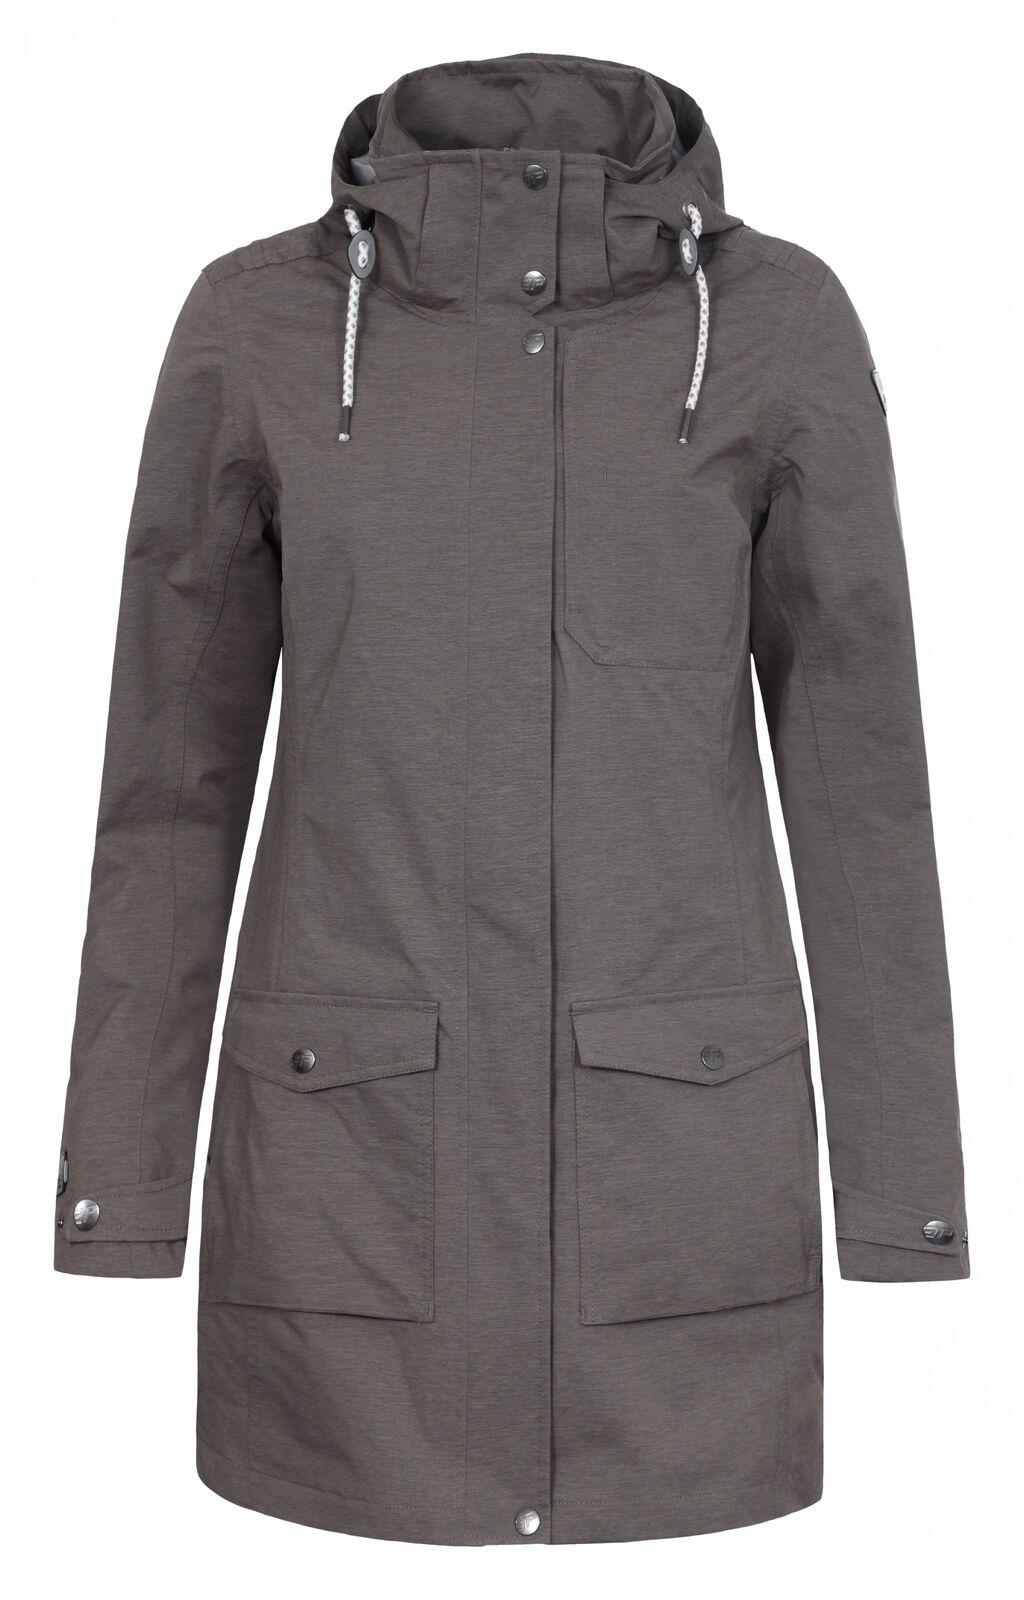 Icepeak Damen Parka LIN 53018-507 dunkel-khaki   Mantel Damen    Up-to-date Styling